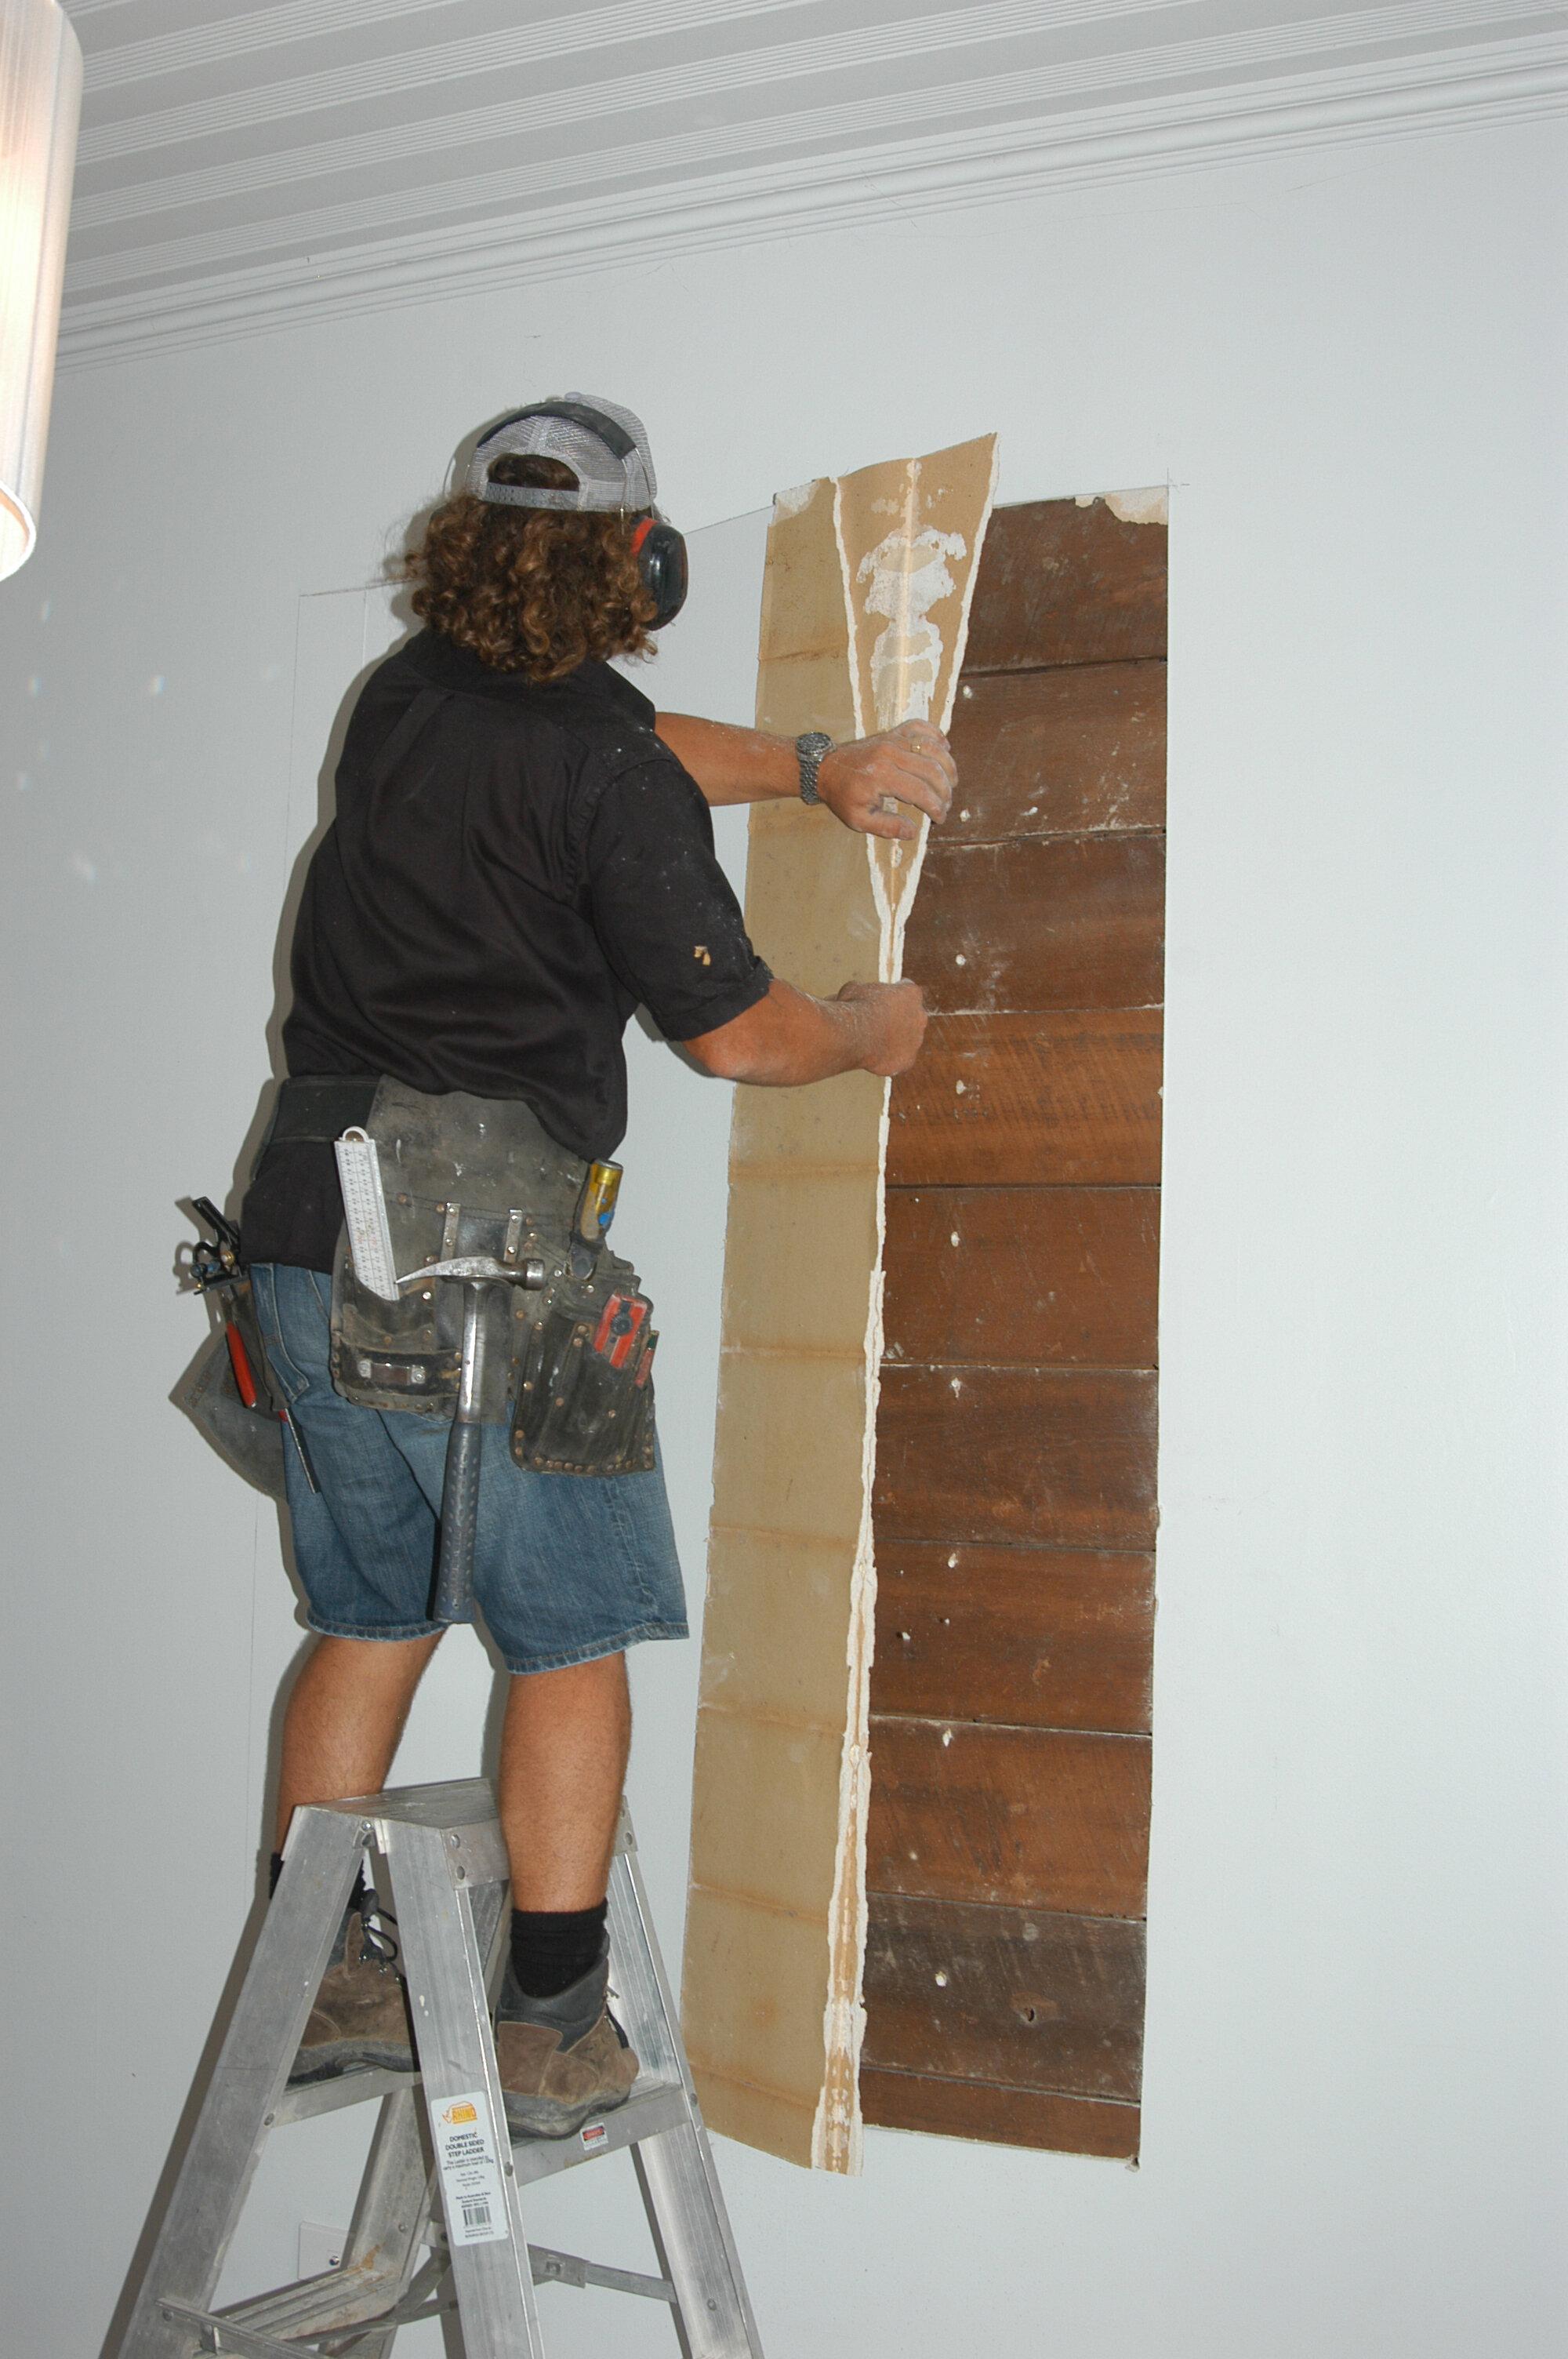 Pull plasterboard off